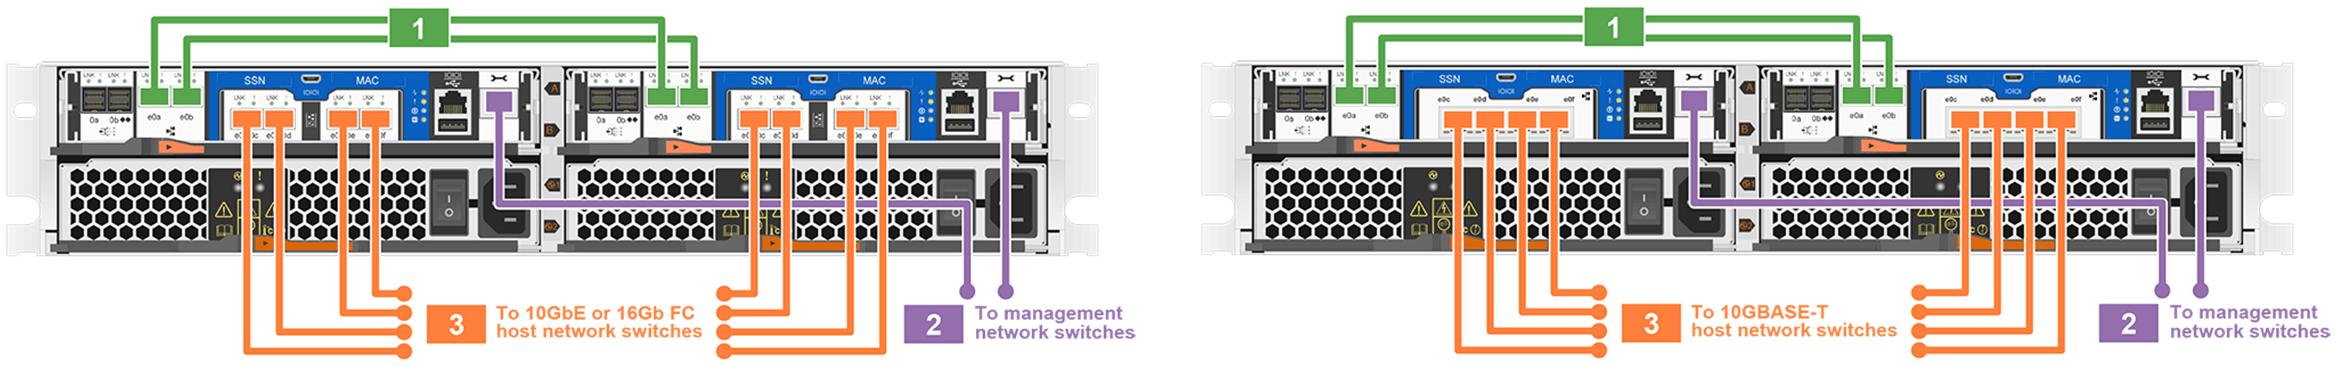 Netapp AFF C190 Switchless Configuration